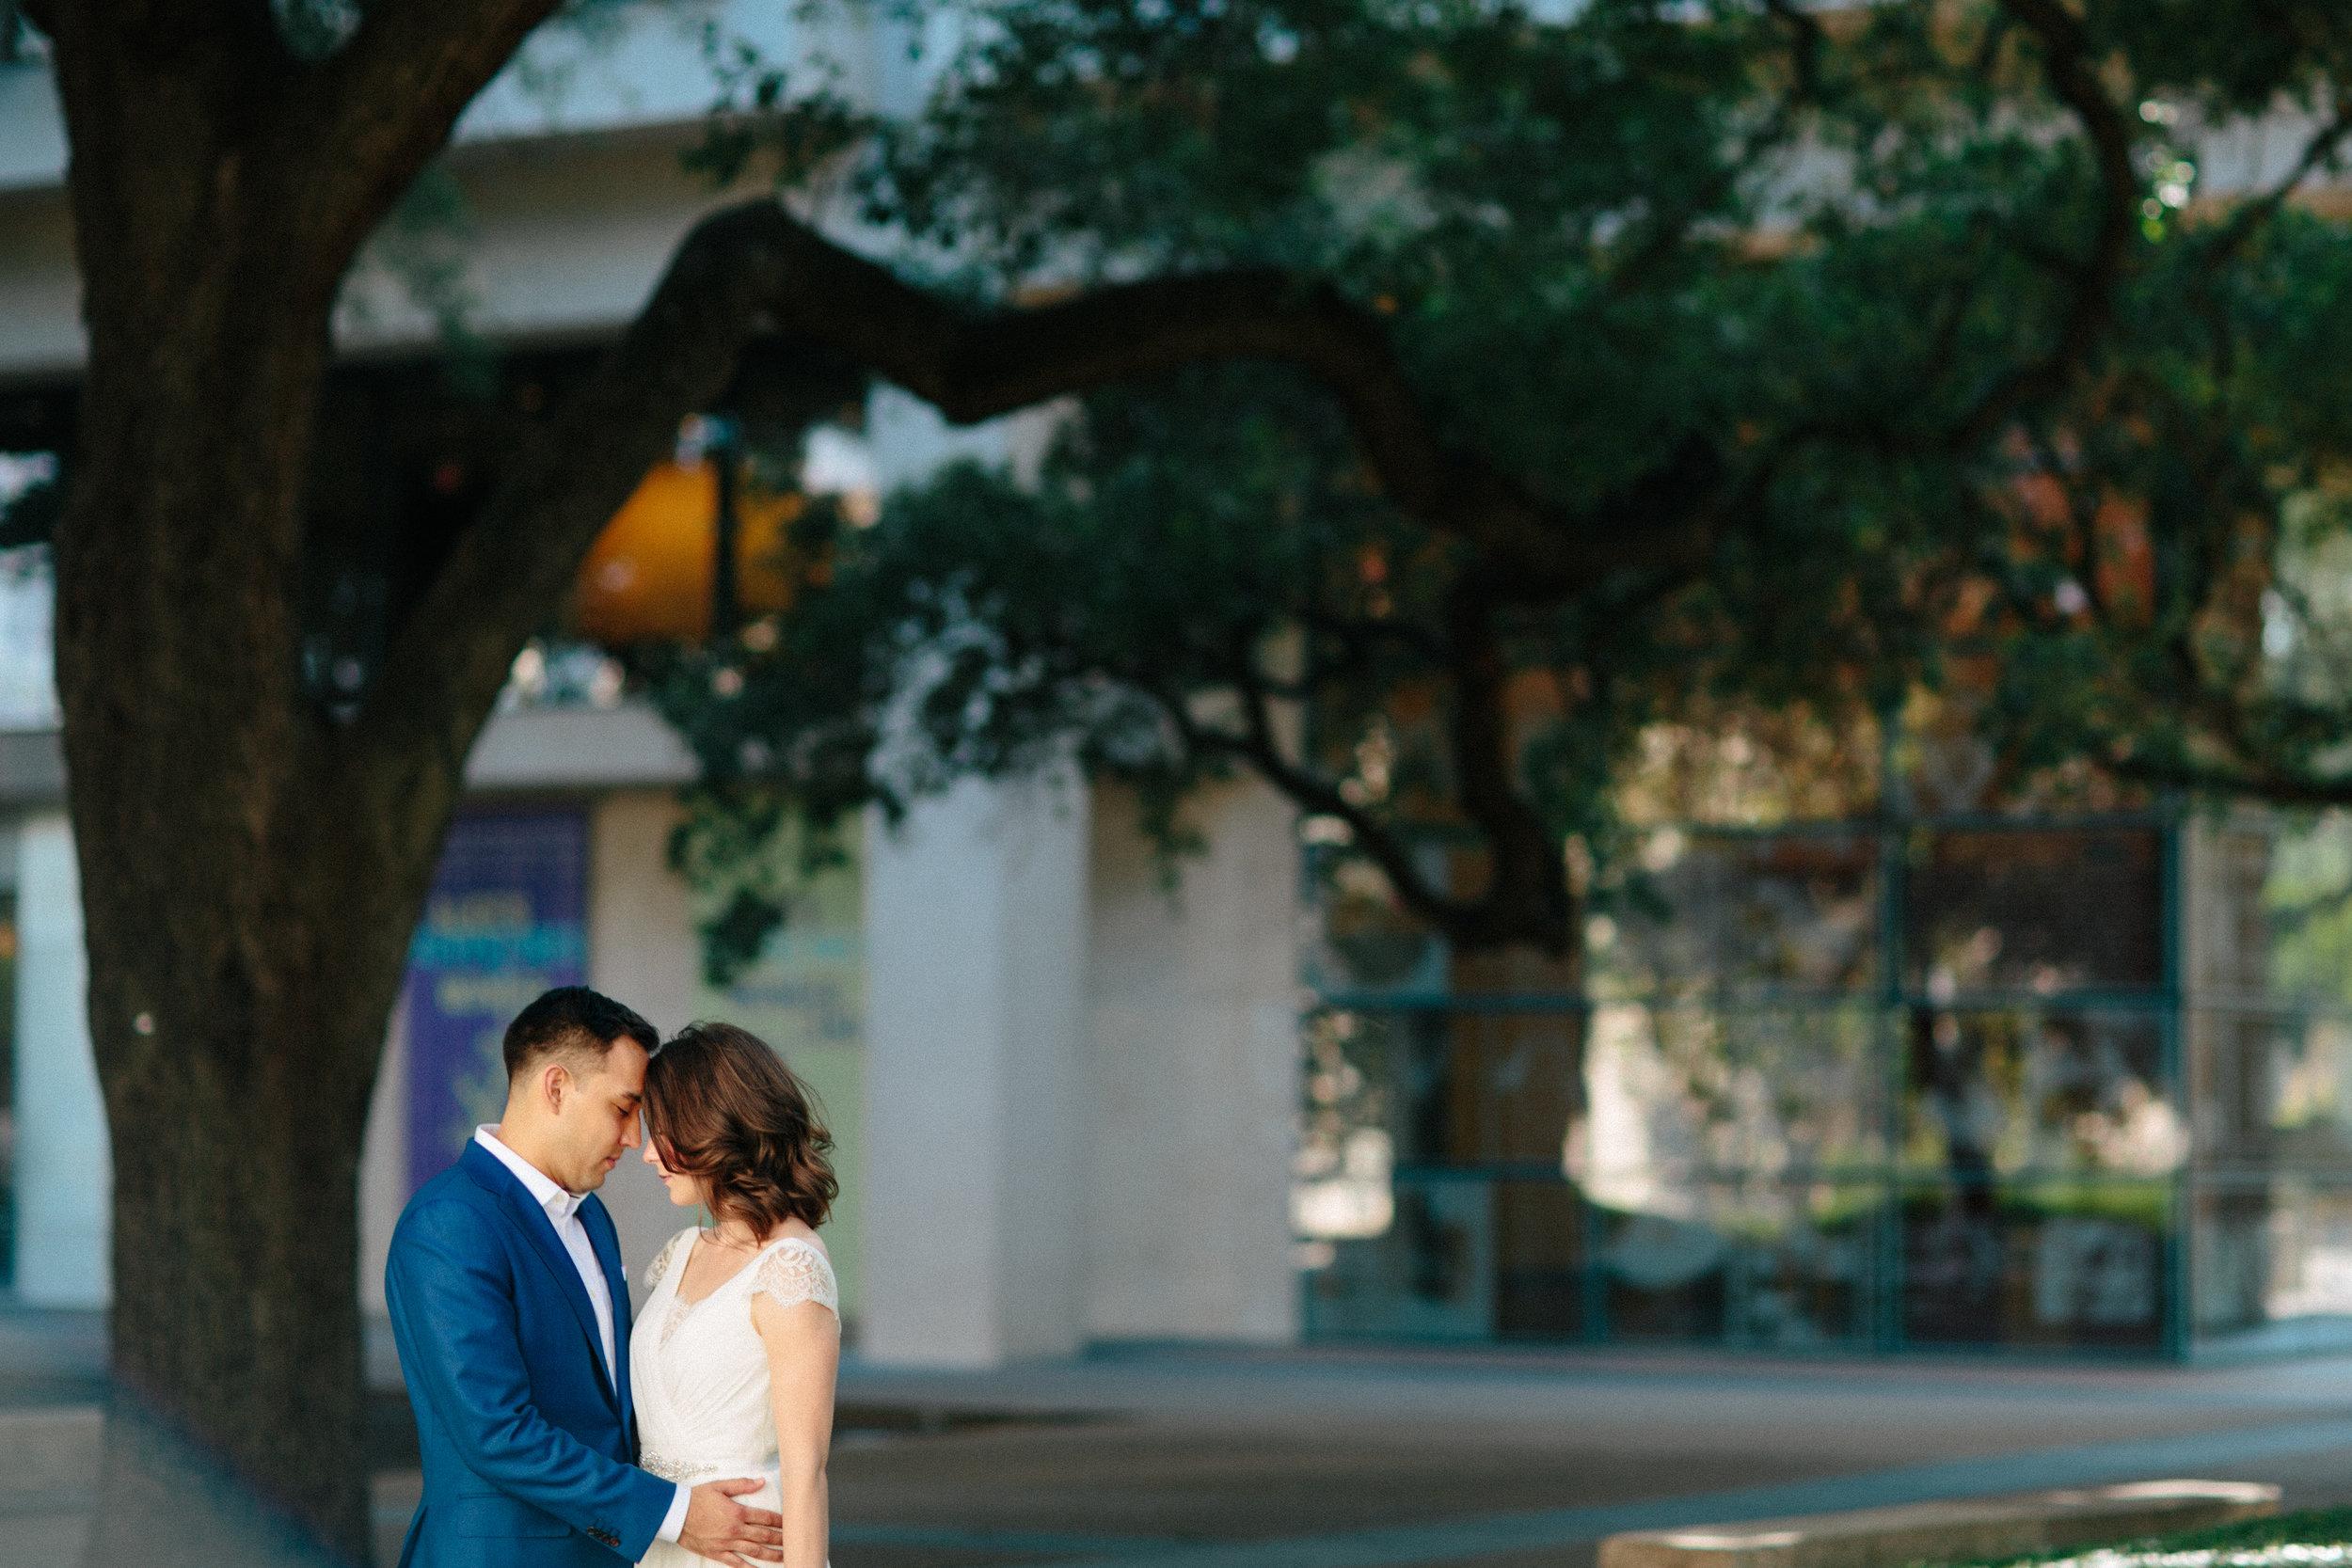 Paige-Newton-Intimate-Wedding-Photography-University-of-Texas-Wedding.jpg